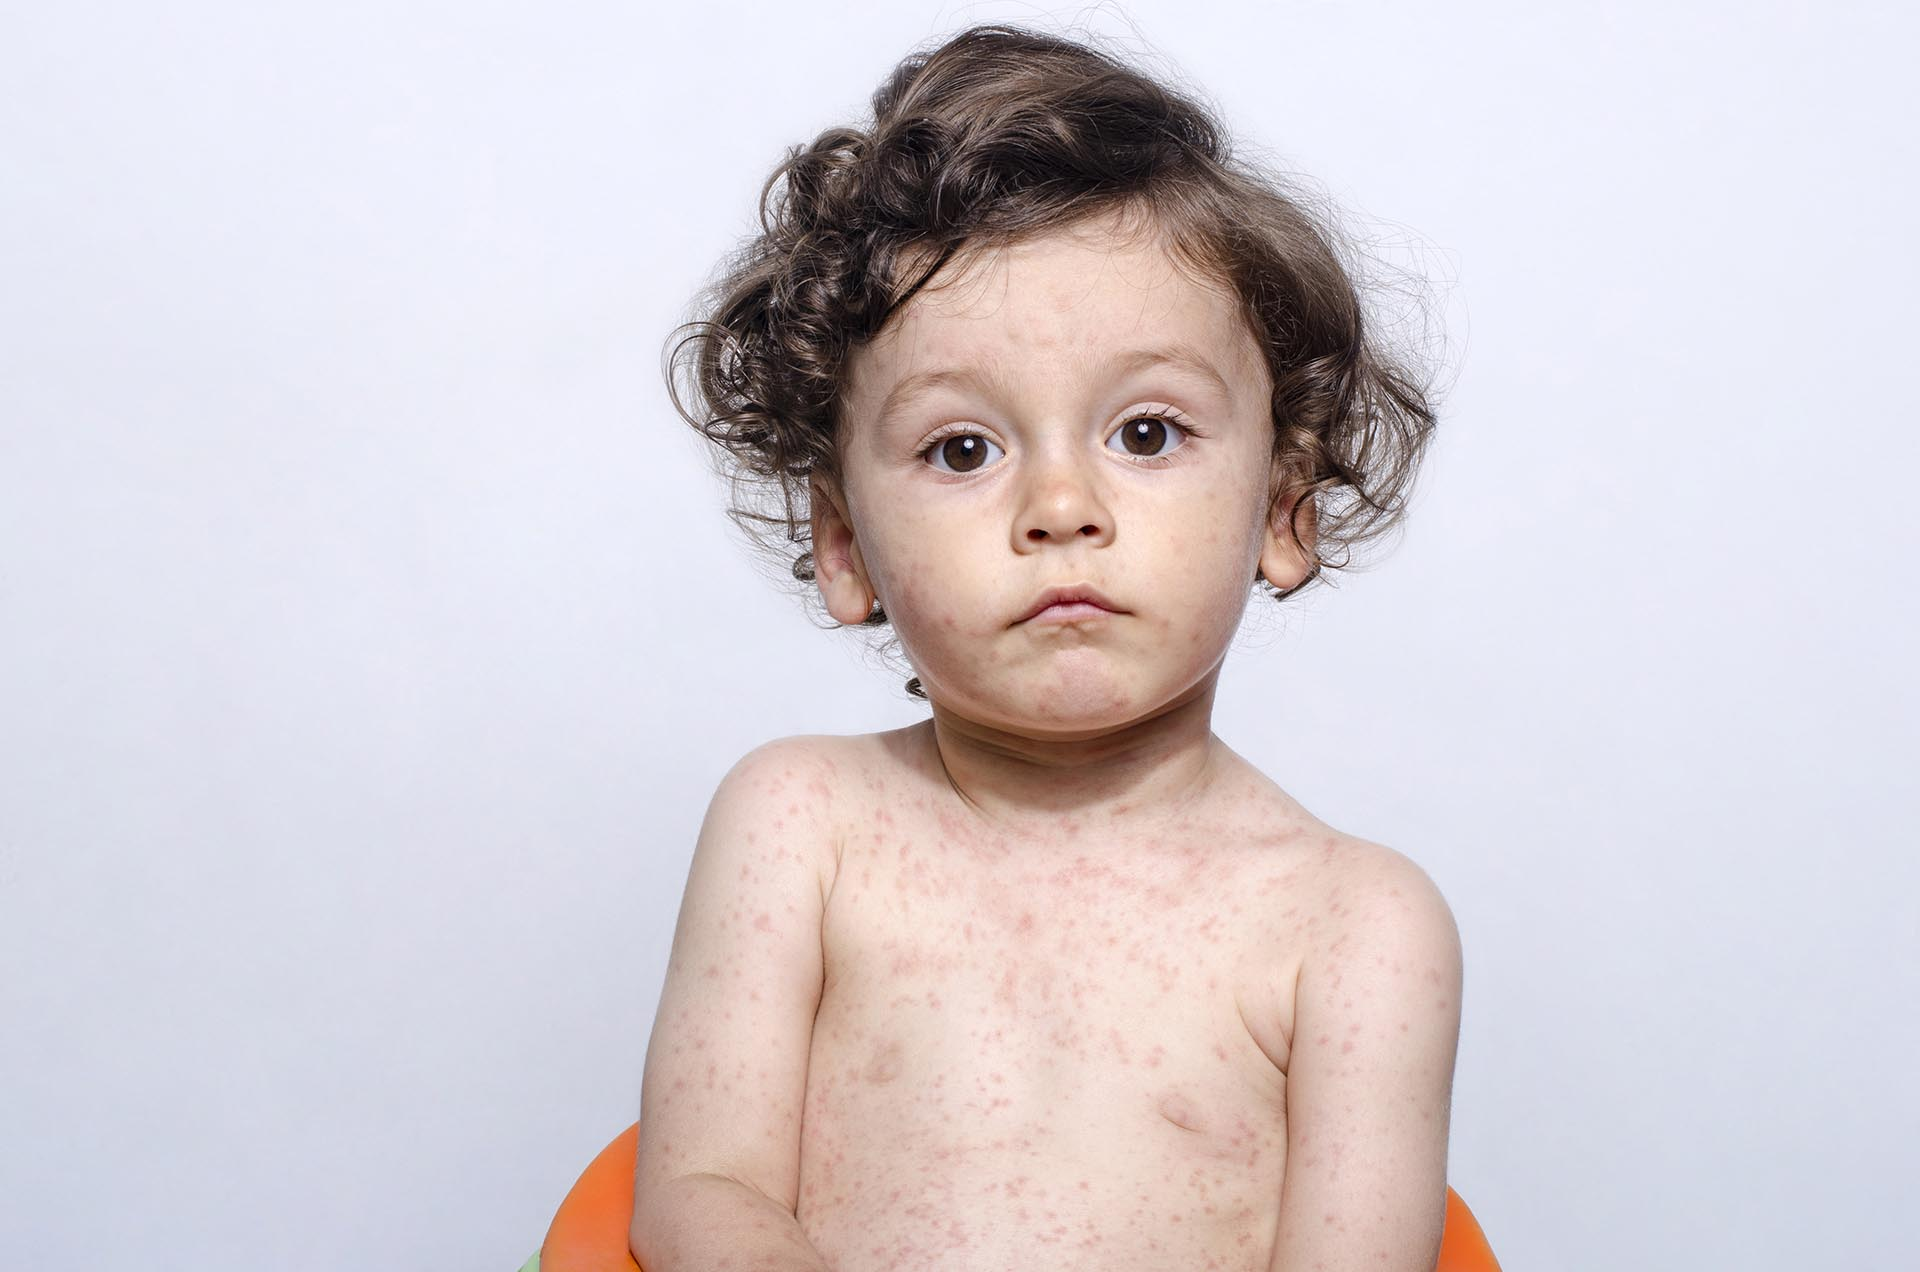 Mumps, Measles, Rubella and Chickenpox